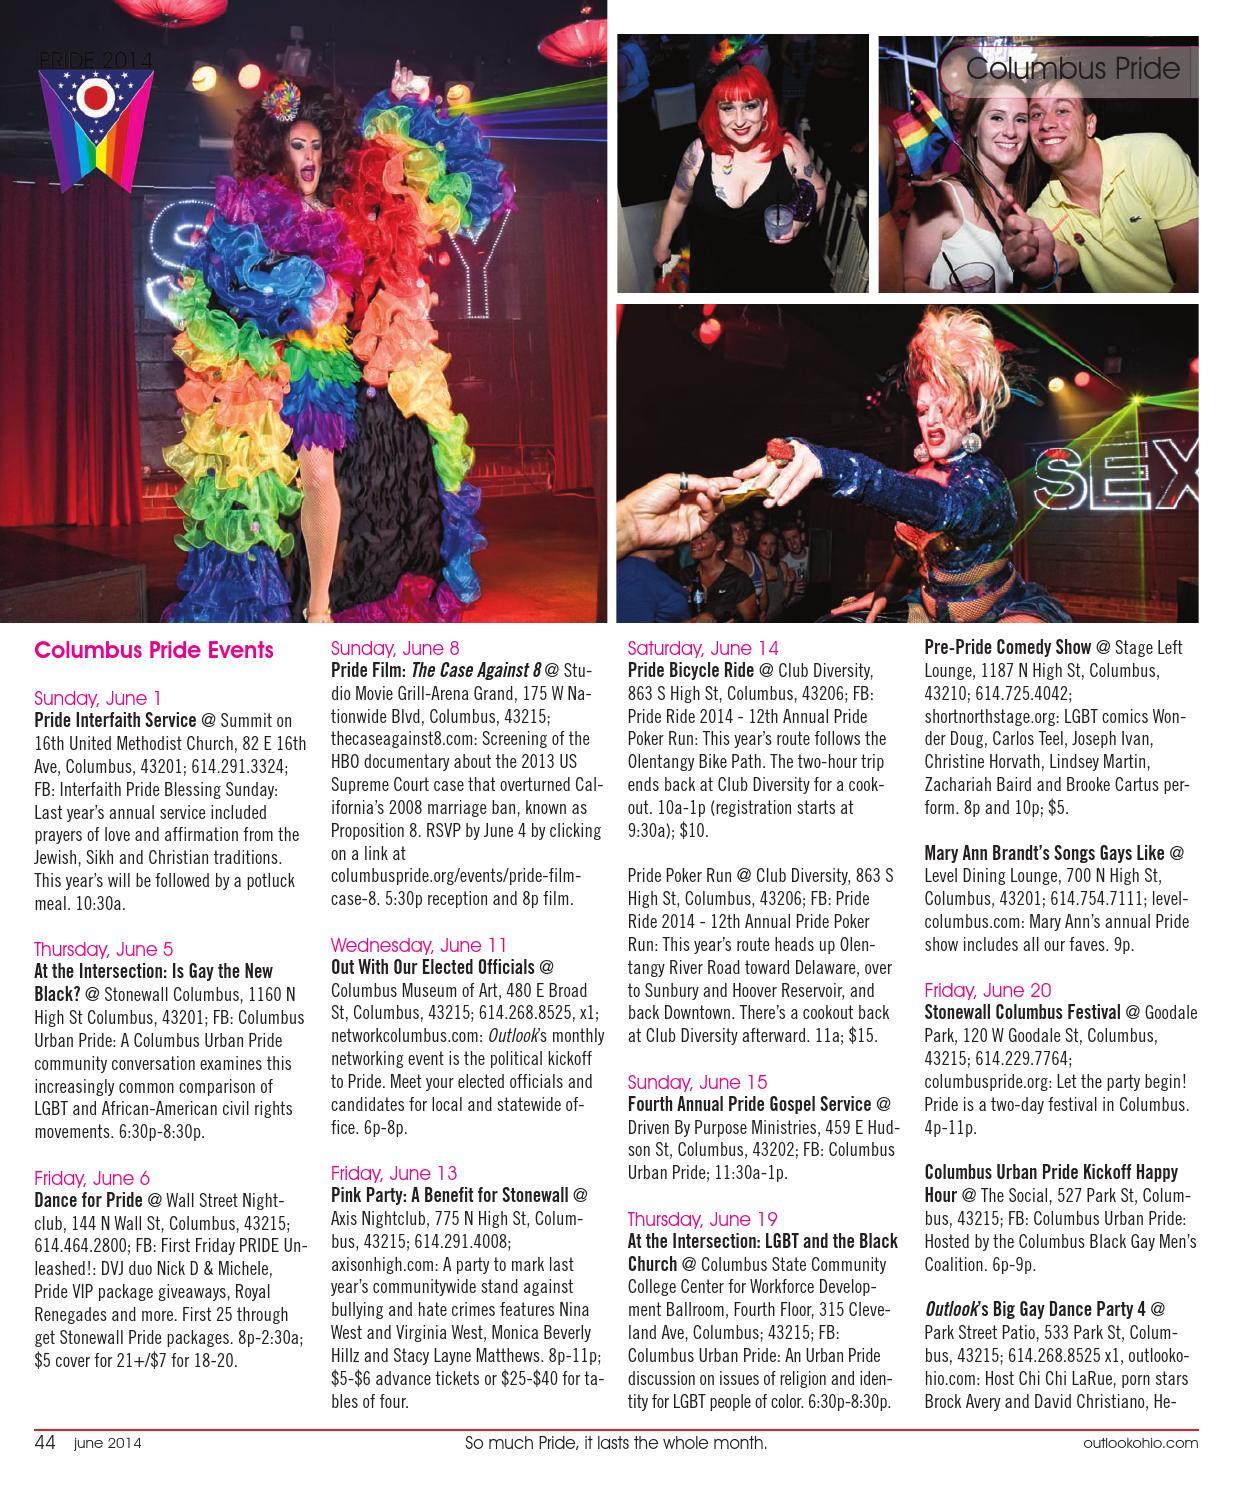 2014-06-01 Outlook Ohio Magazine by Outlook Media, Inc - issuu